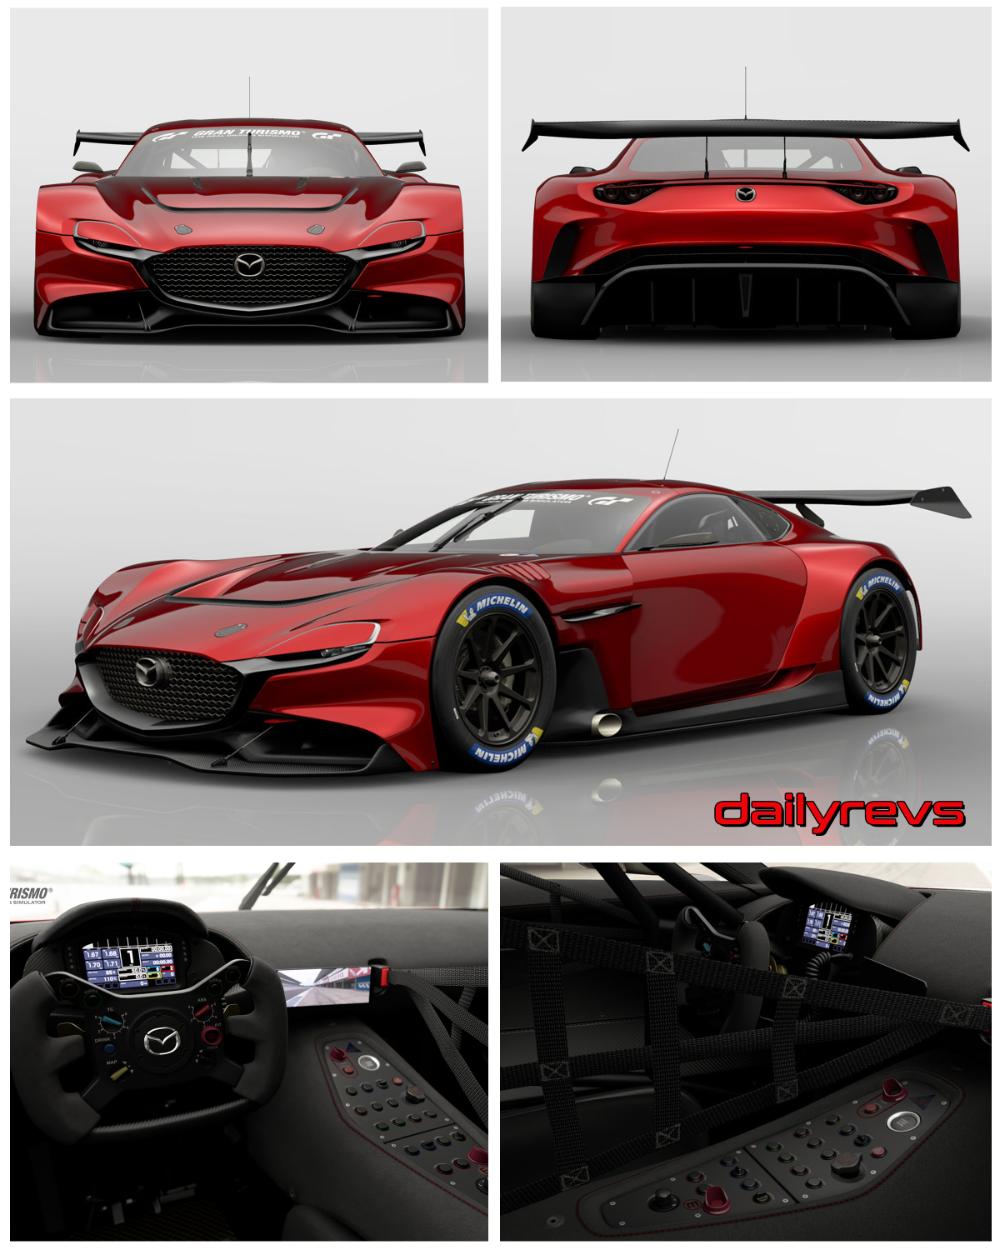 2020 Mazda Rx Vision Gt3 Concept Dailyrevs Com In 2020 Mazda Concept Car Sketch Concept Cars